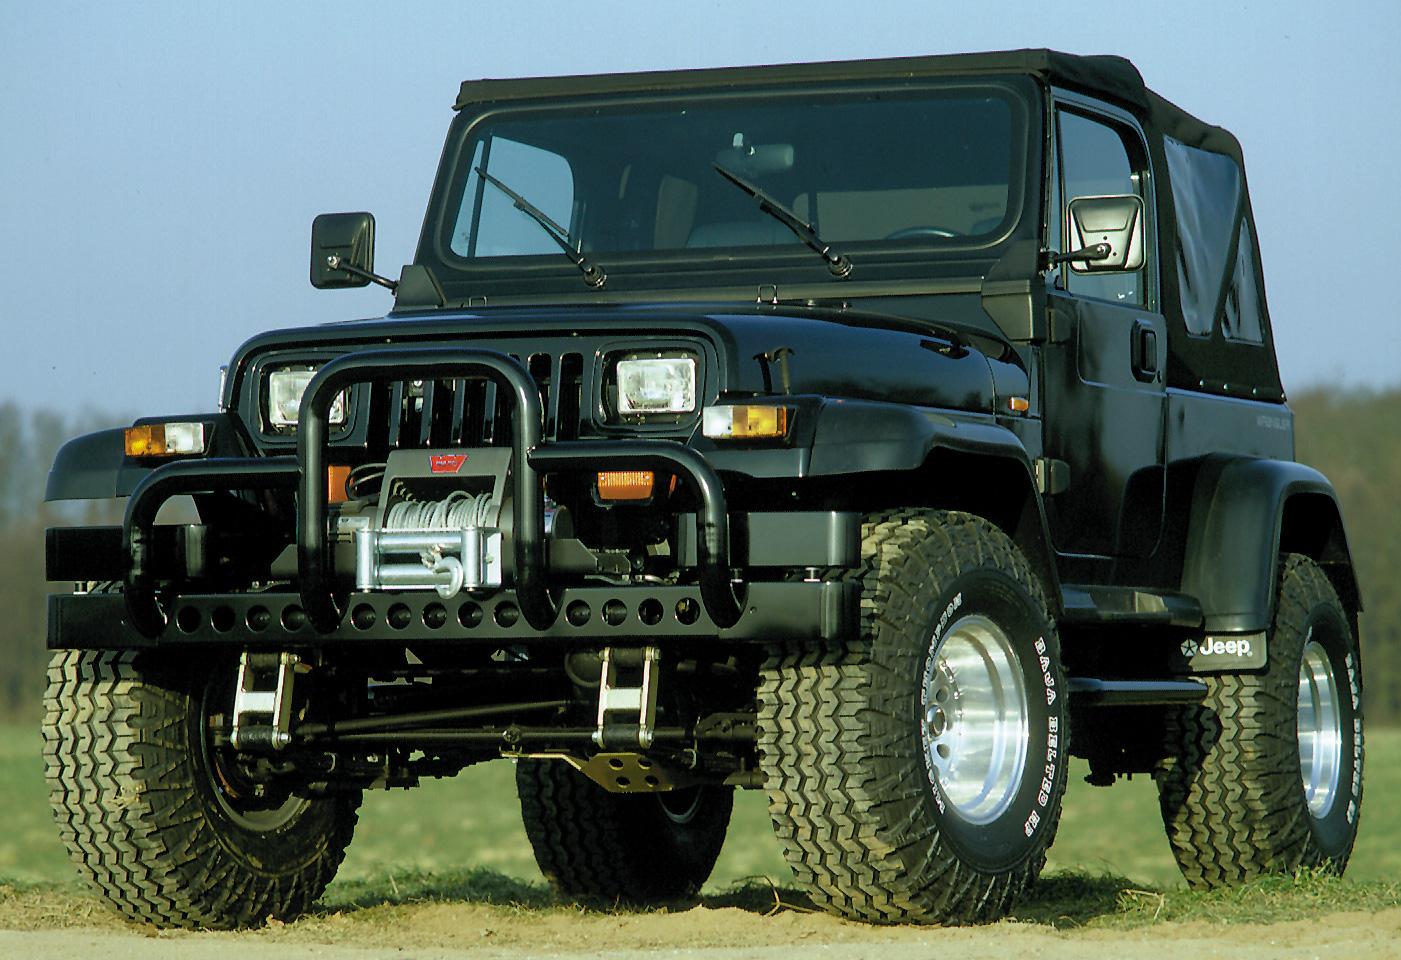 verbreiterung 10 zoll jeep wrangler yj 86 96 kotfl gelverbreiterung pu rim ebay. Black Bedroom Furniture Sets. Home Design Ideas